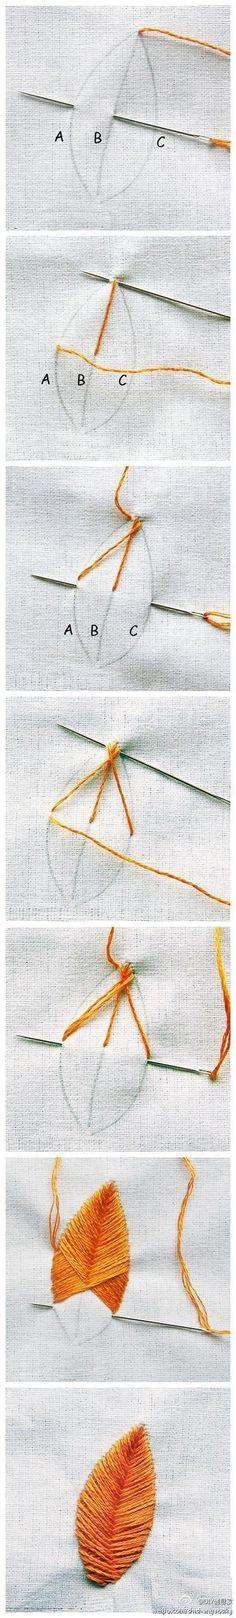 Leaf knitting pattern tutorial